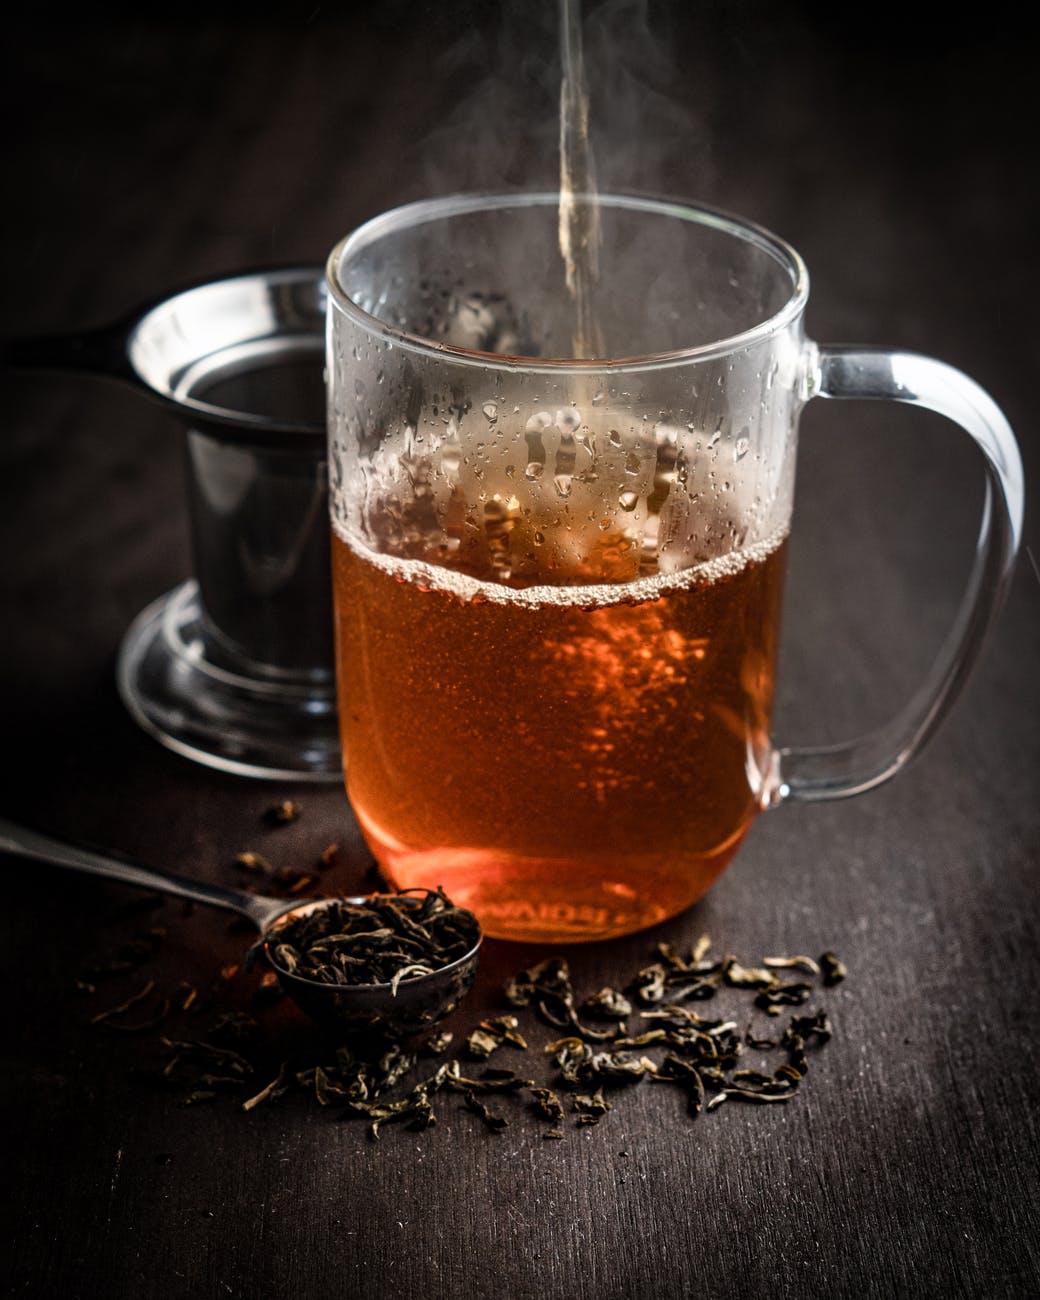 mejor té para beber